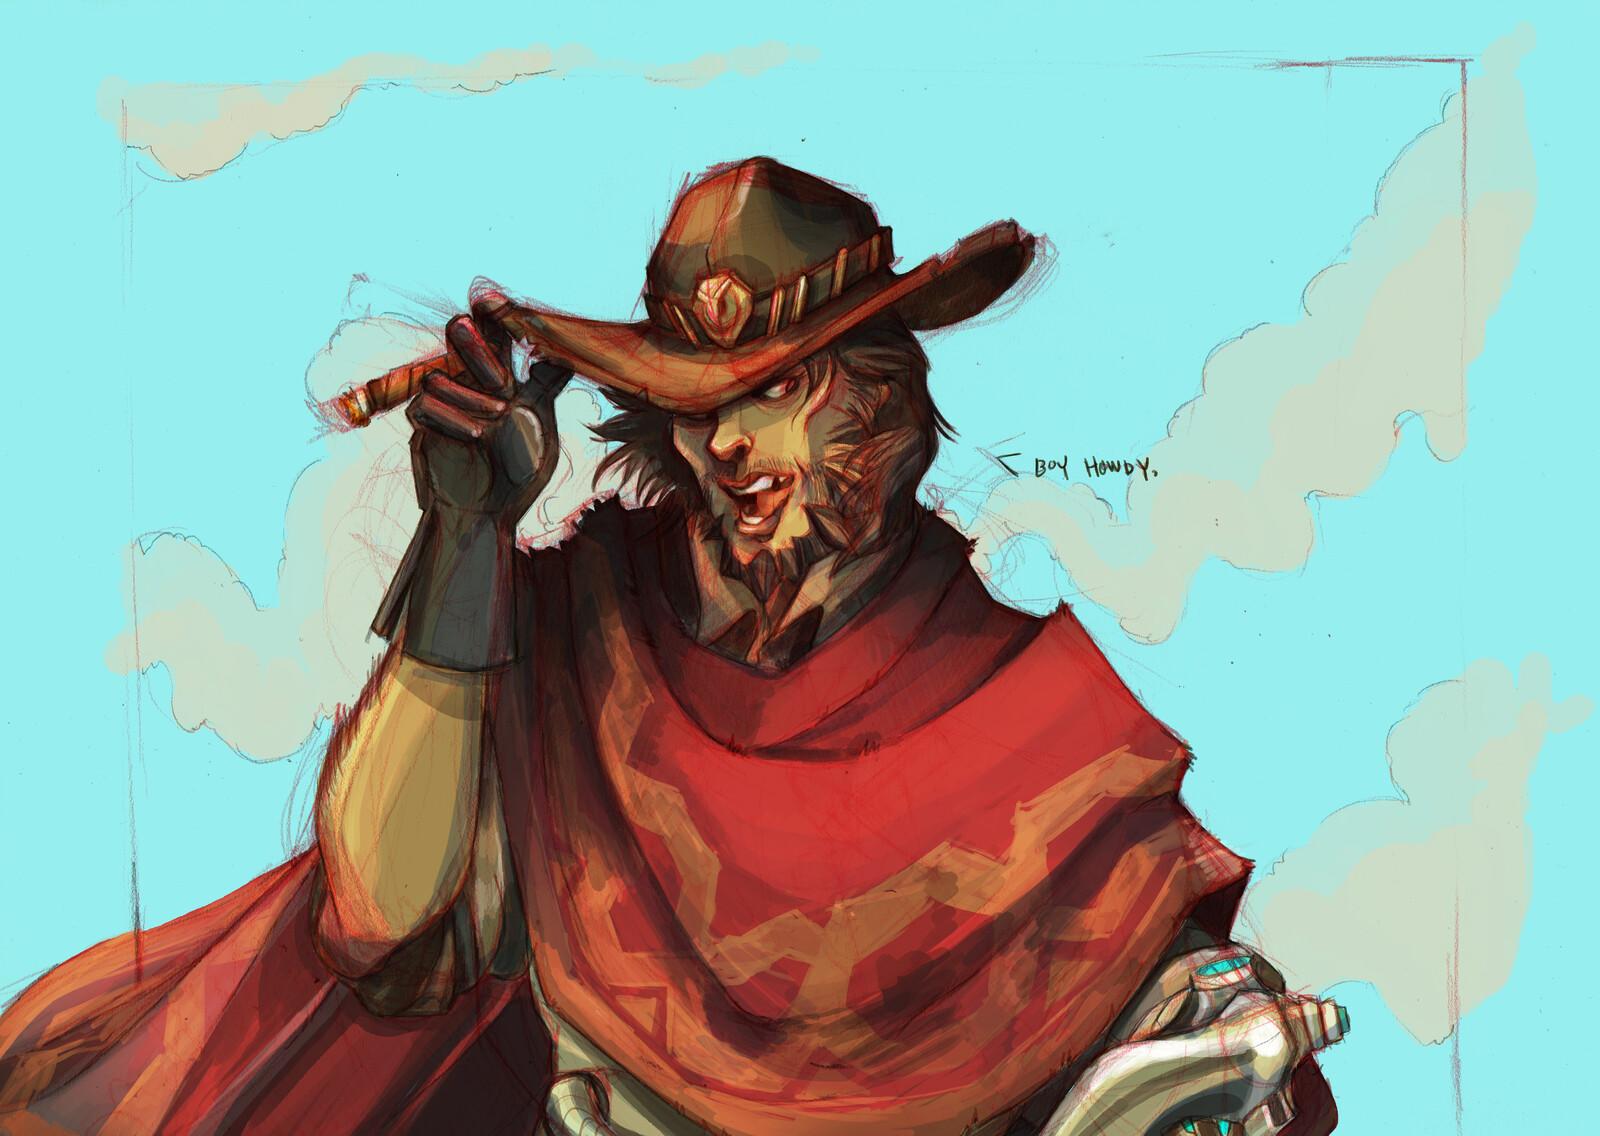 Overwatch: boy howdy